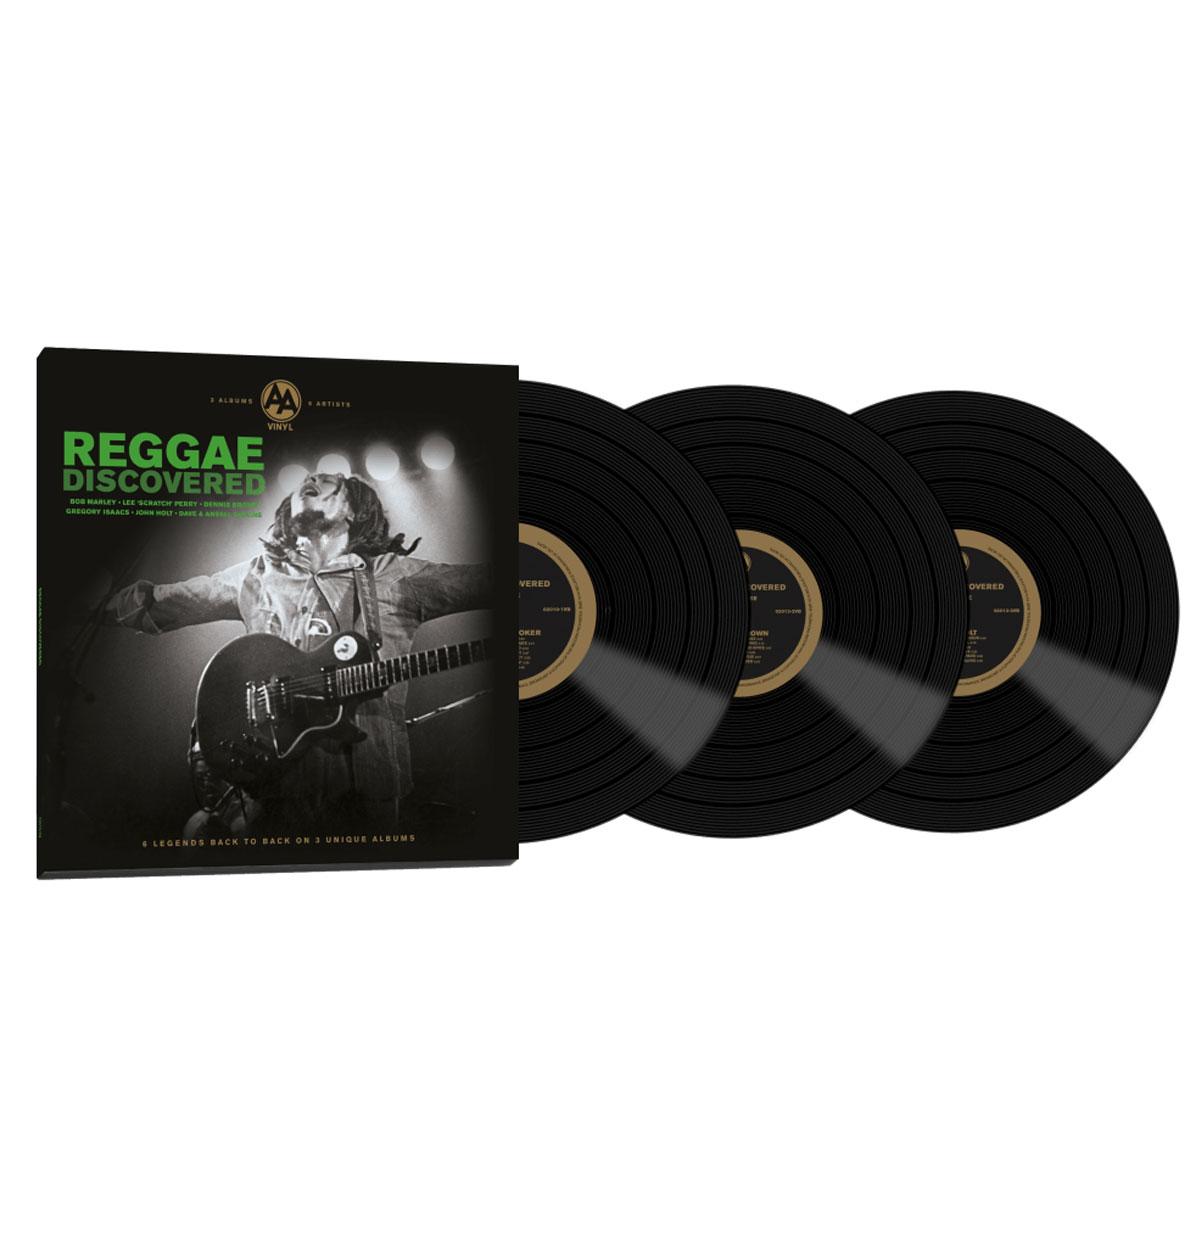 Various Artists - Reggae Discovered 3 LP